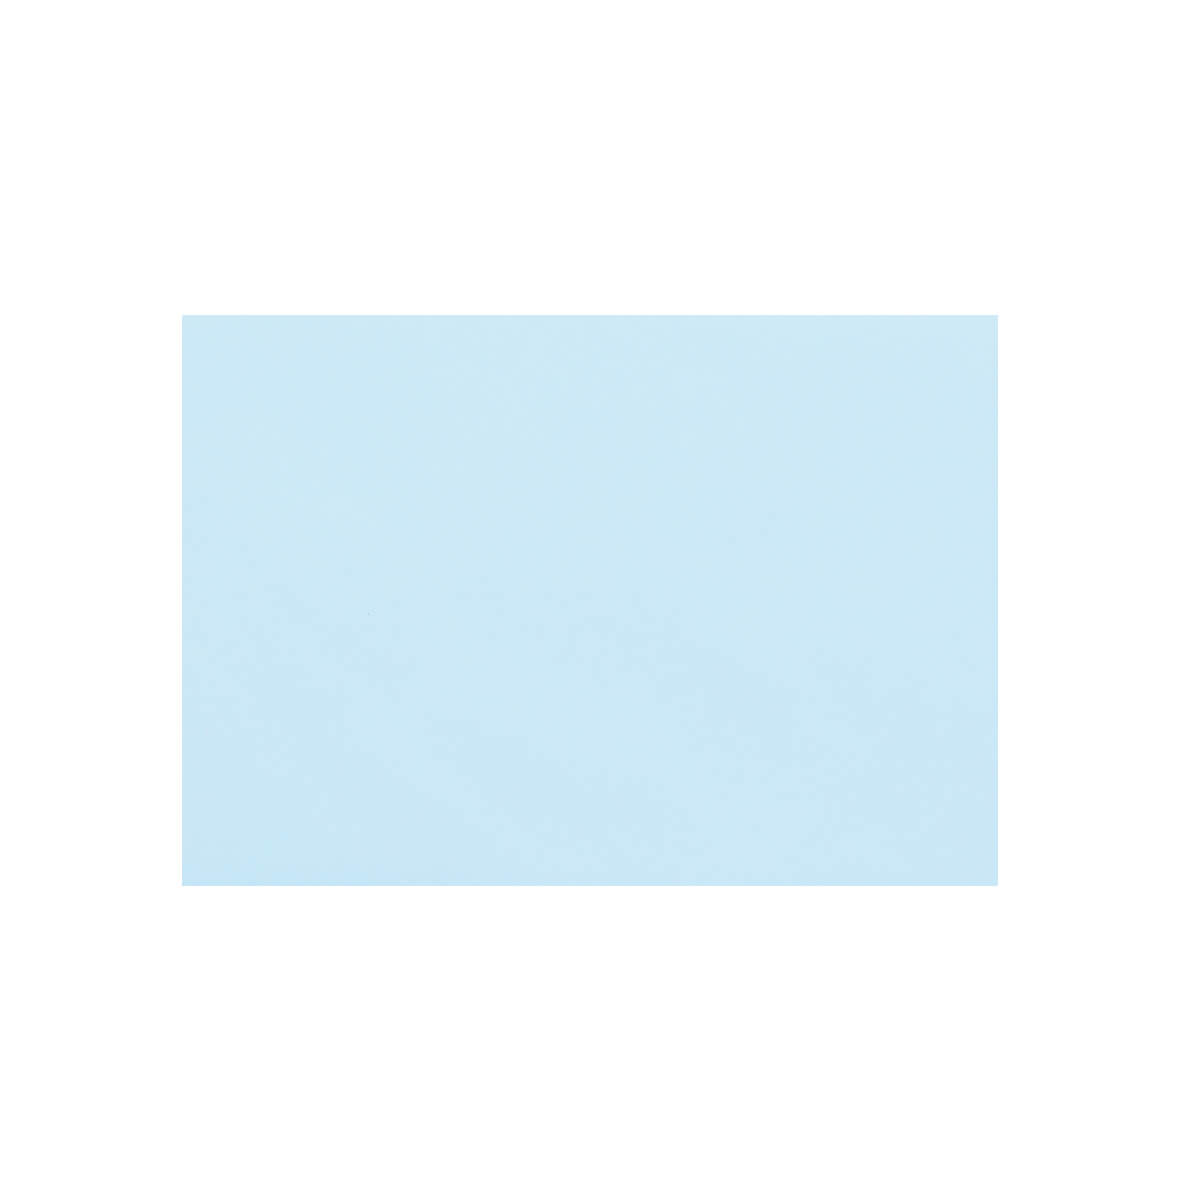 PALE BLUE 70 x 100mm GIFT TAG ENVELOPES 120GSM